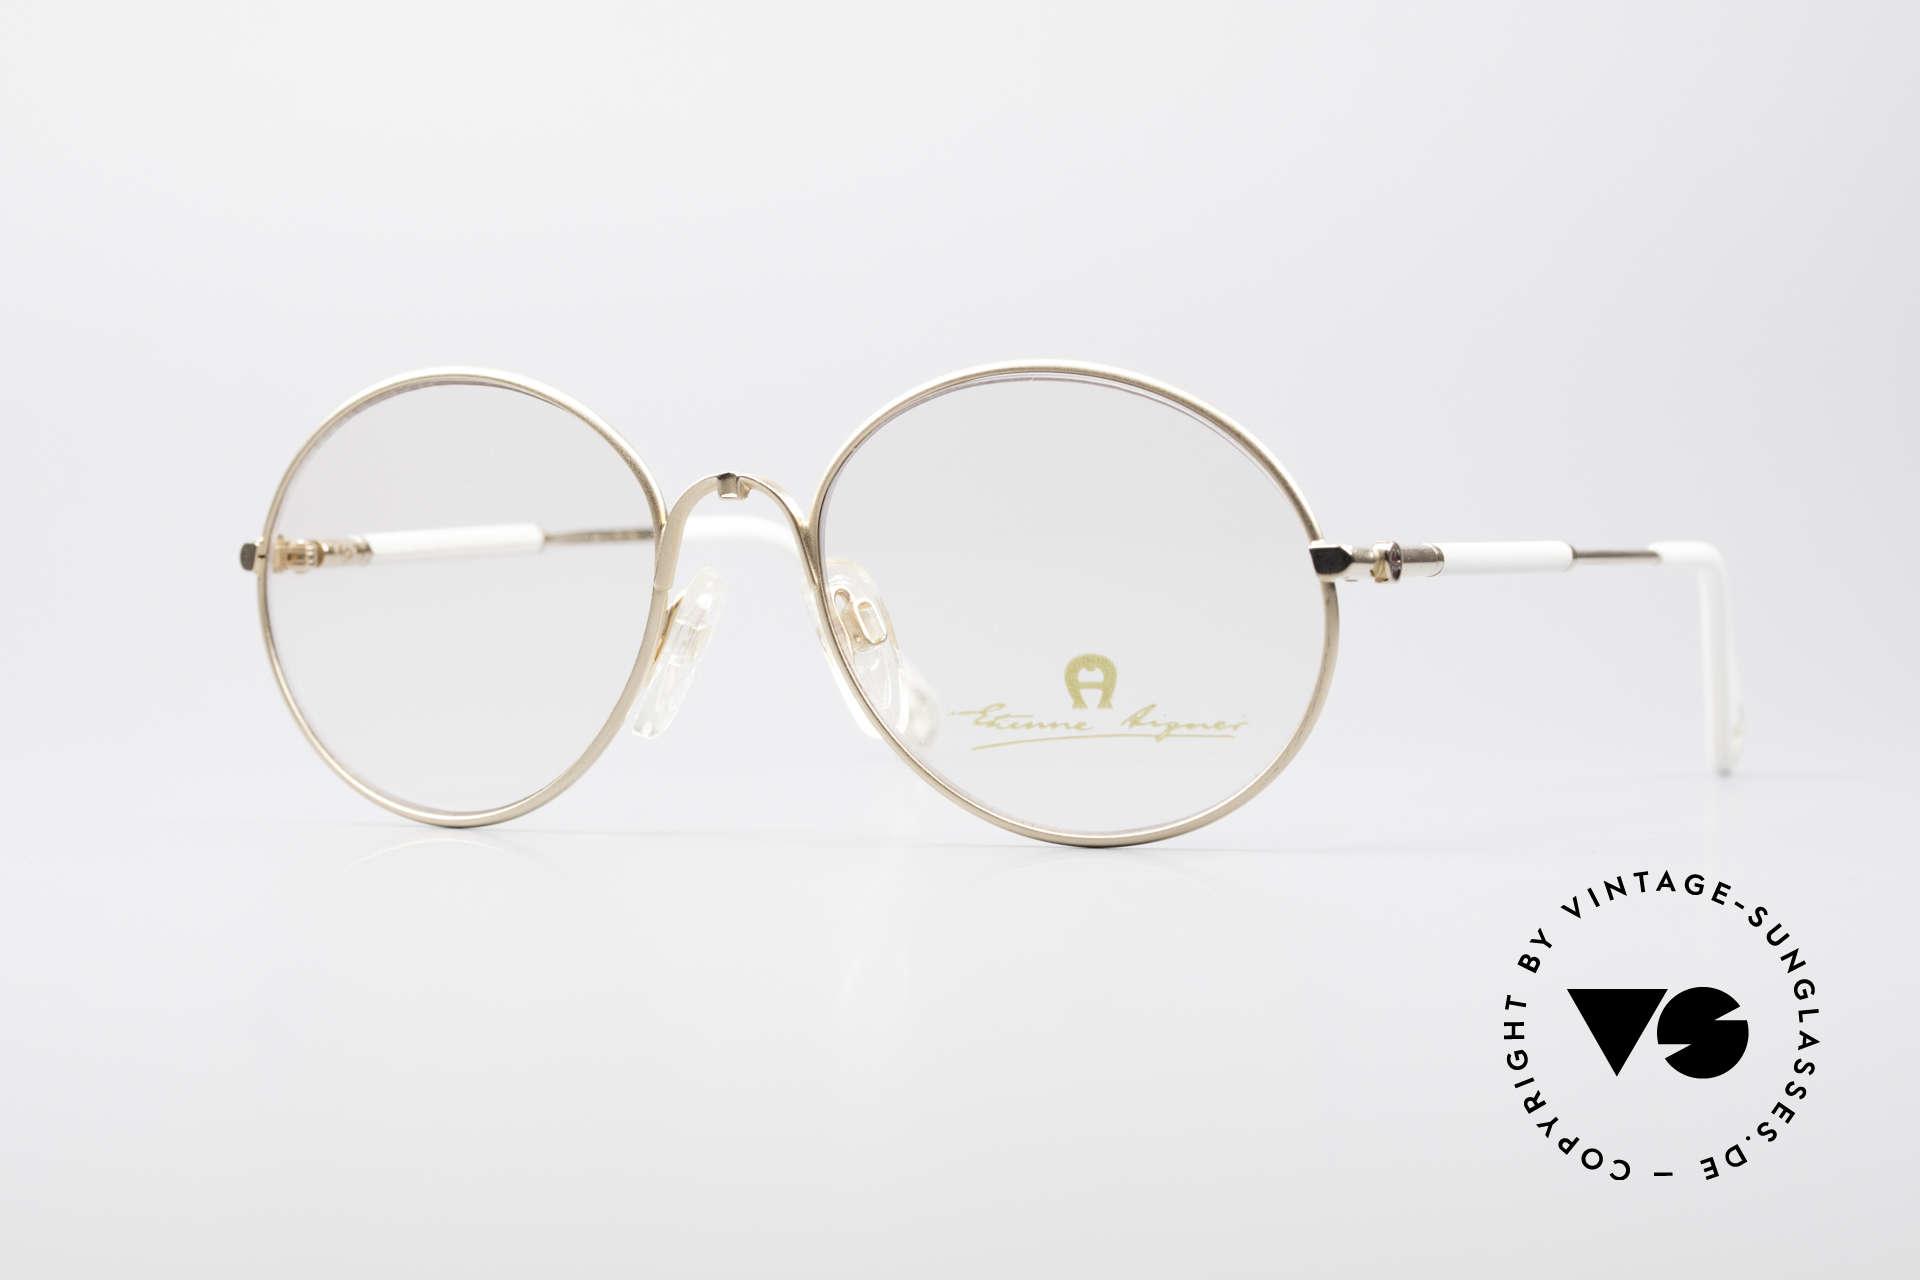 Aigner EA13 Small Round 80's Eyeglasses, Etienne Aigner vintage designer glasses of the 80s, Made for Women